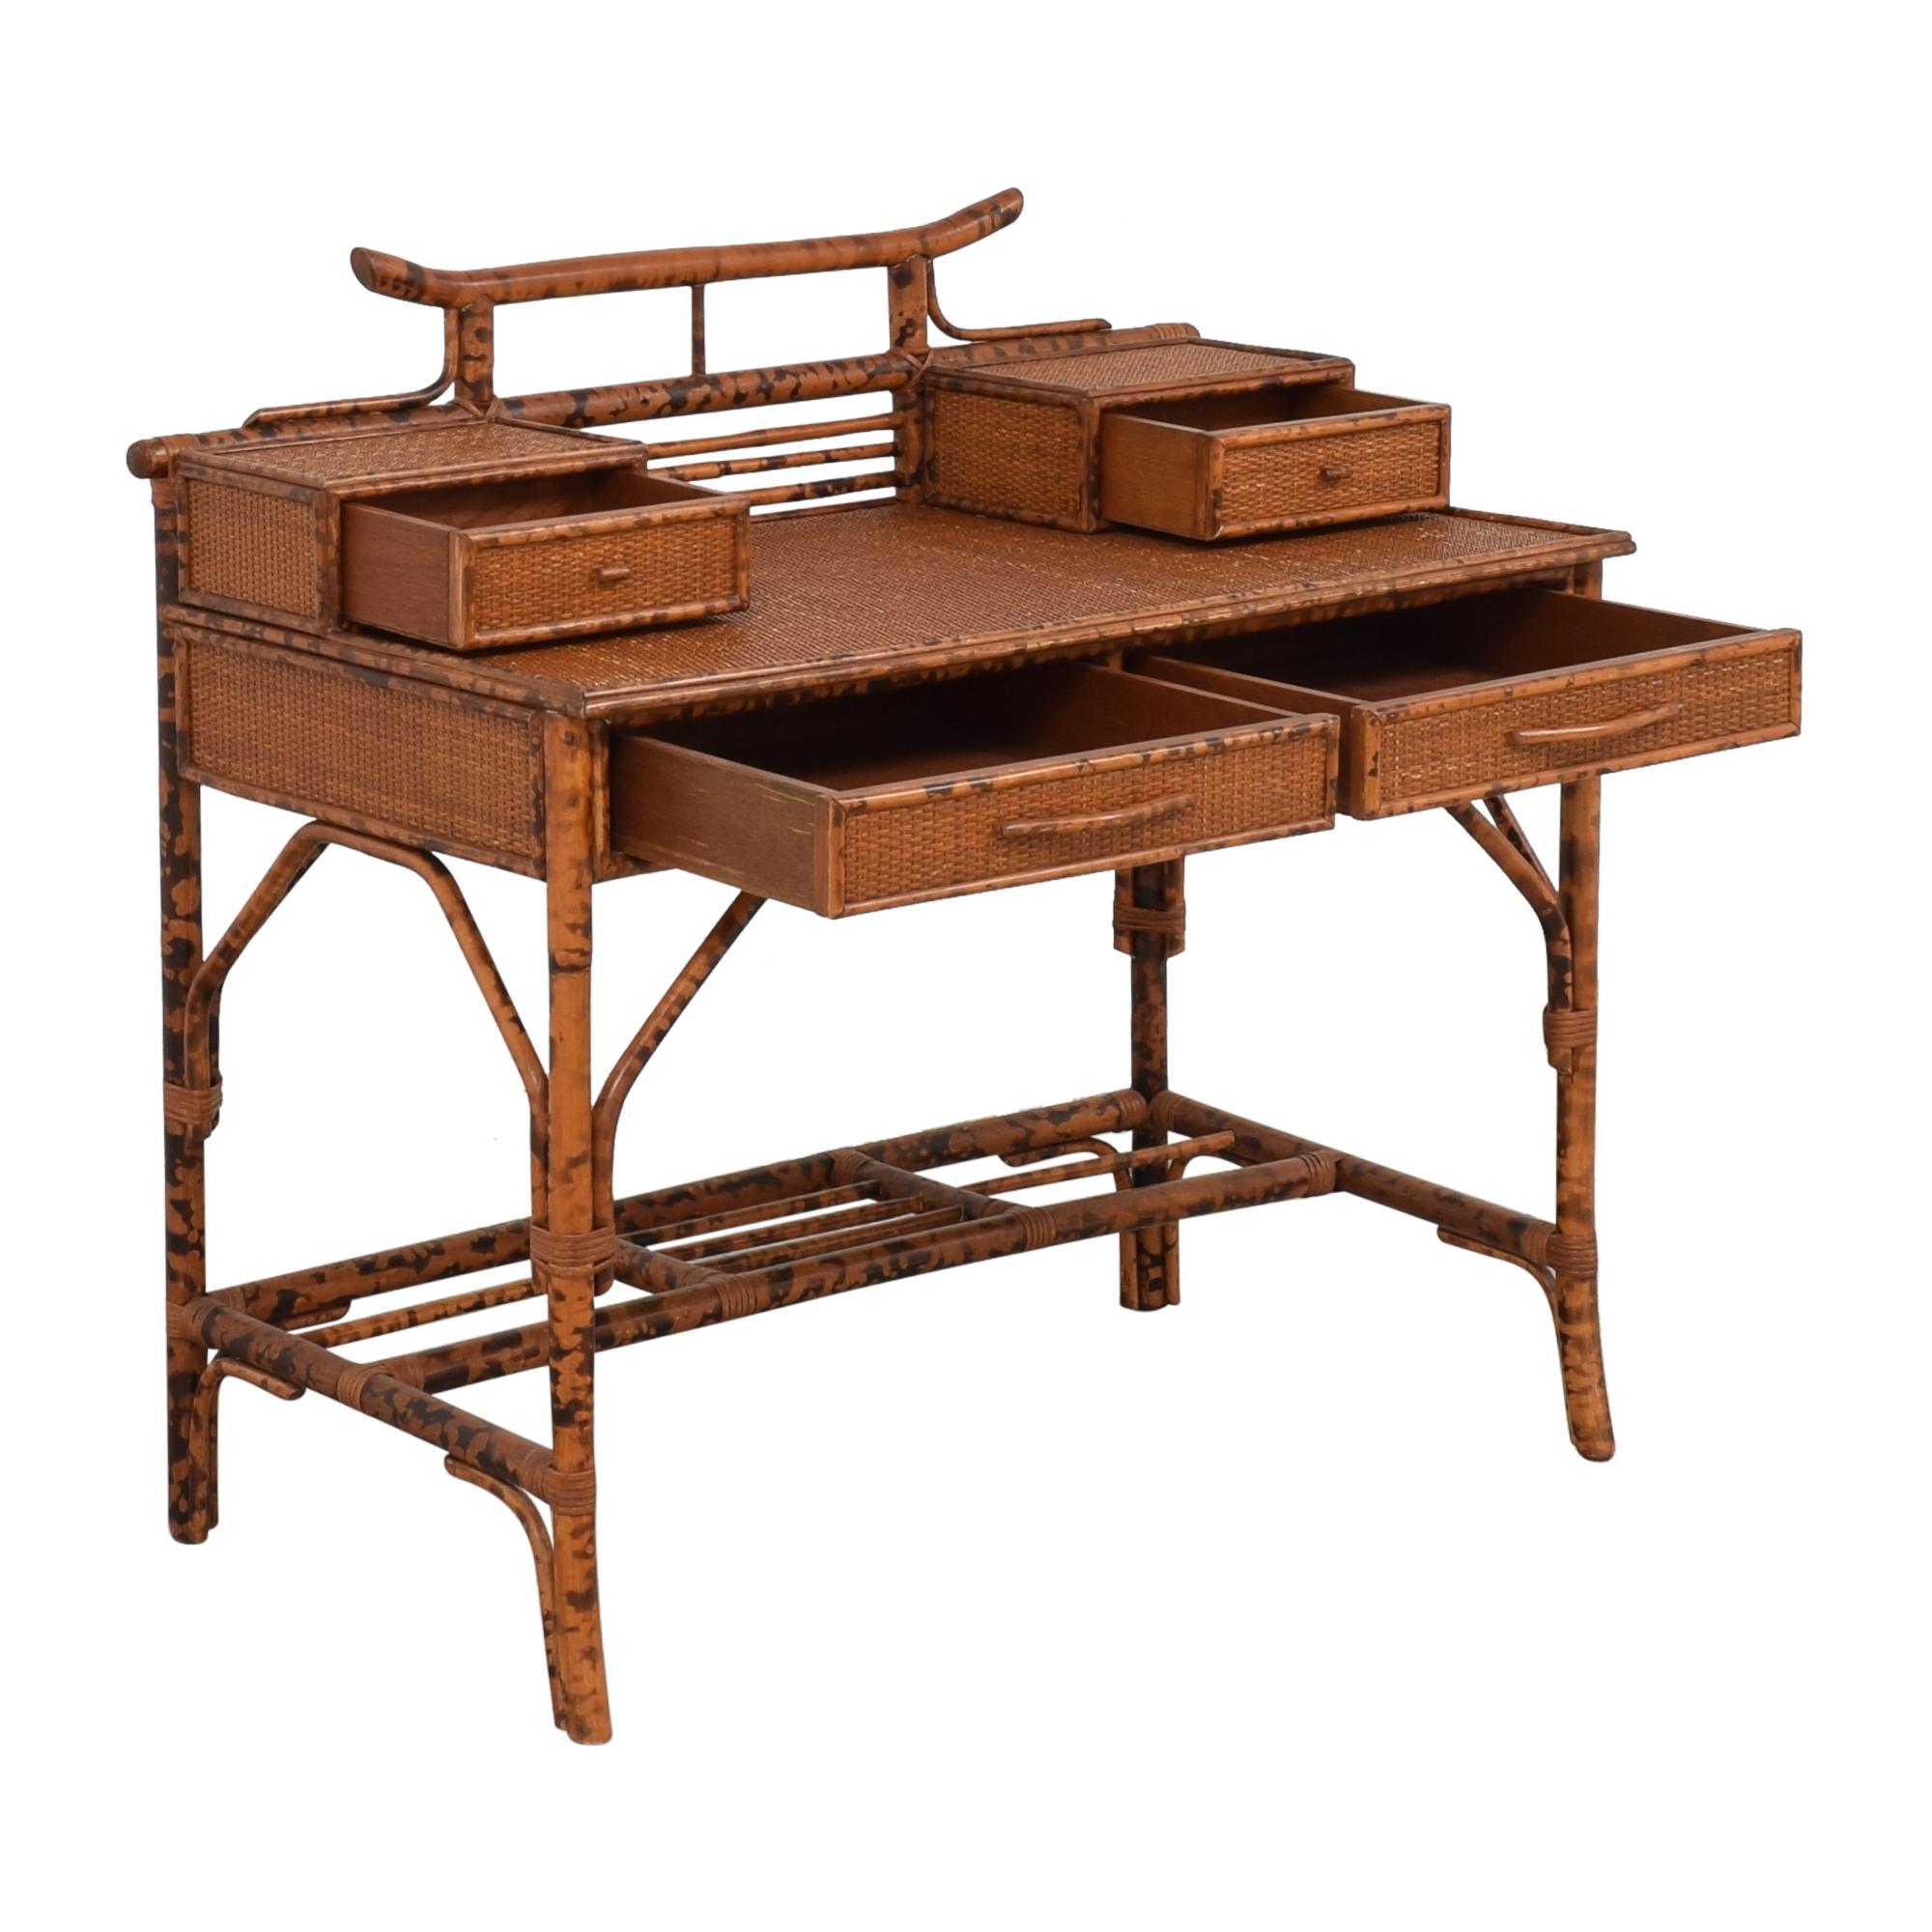 buy Bloomingdale's Chinoiserie Style Writing Desk Bloomingdale's Tables